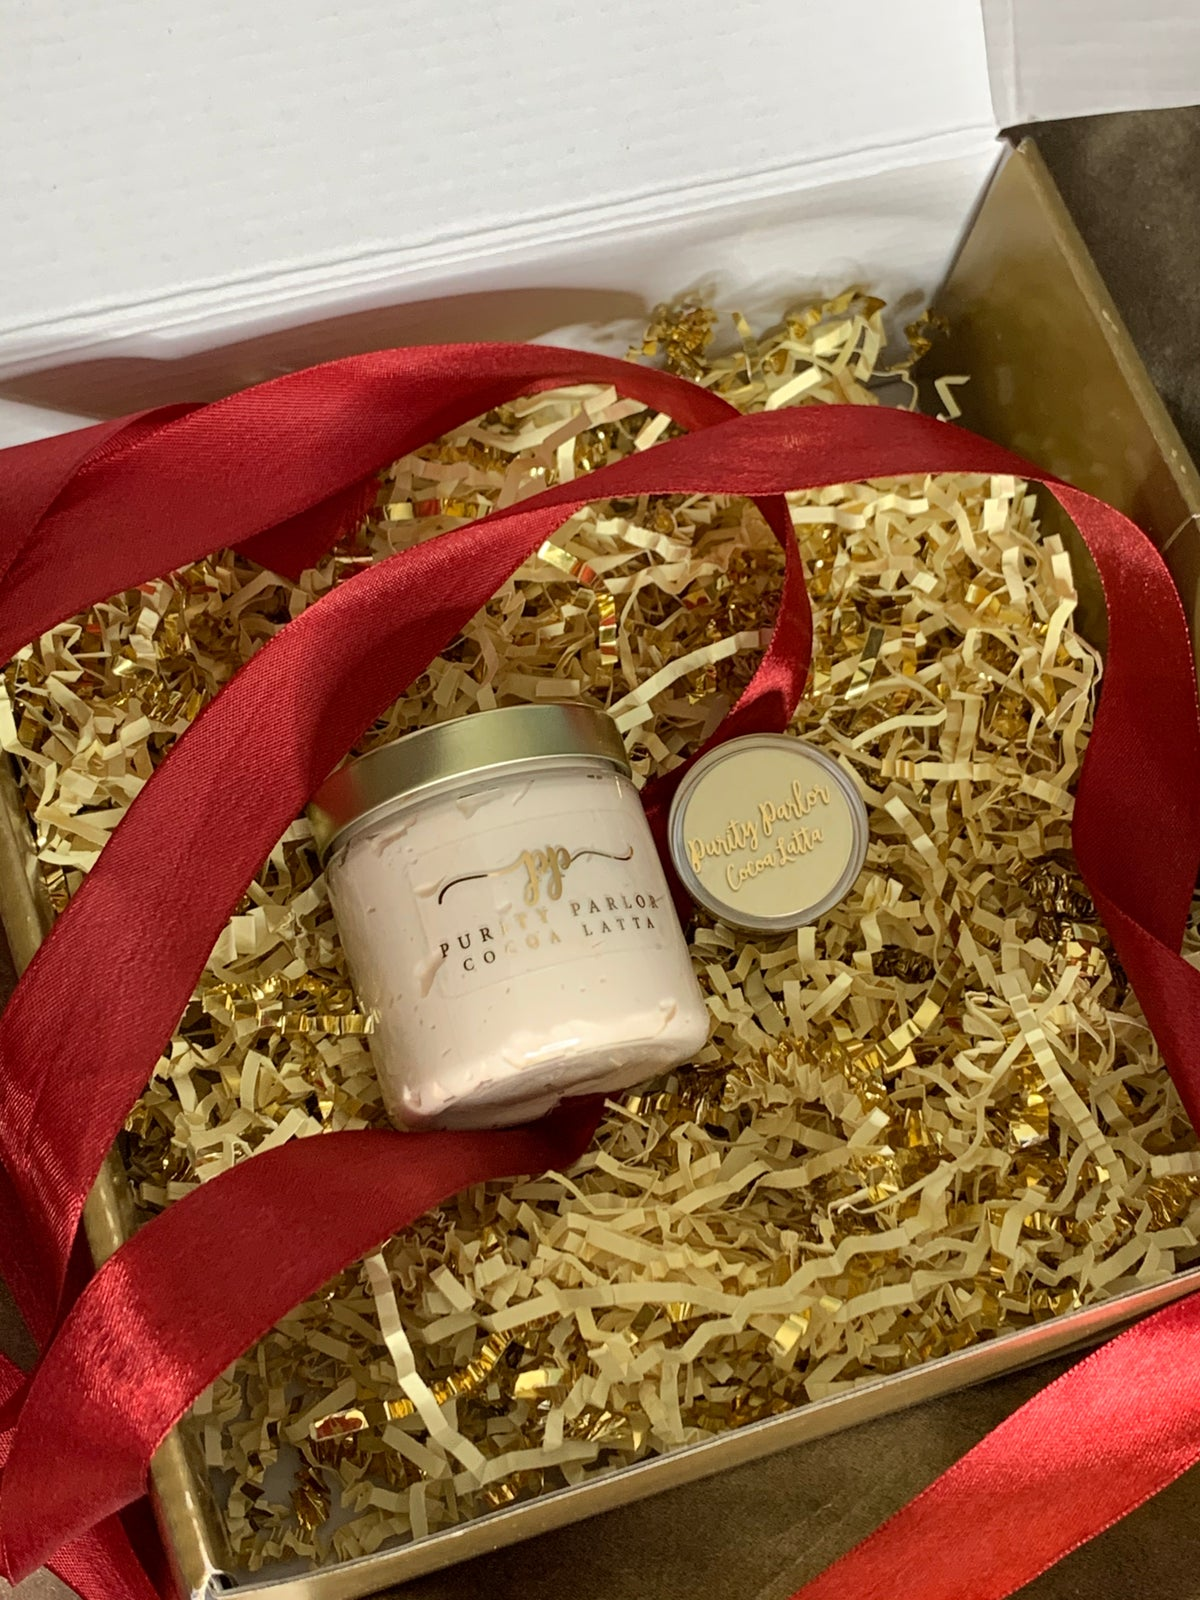 HER Gift Set in Cocoa Latta